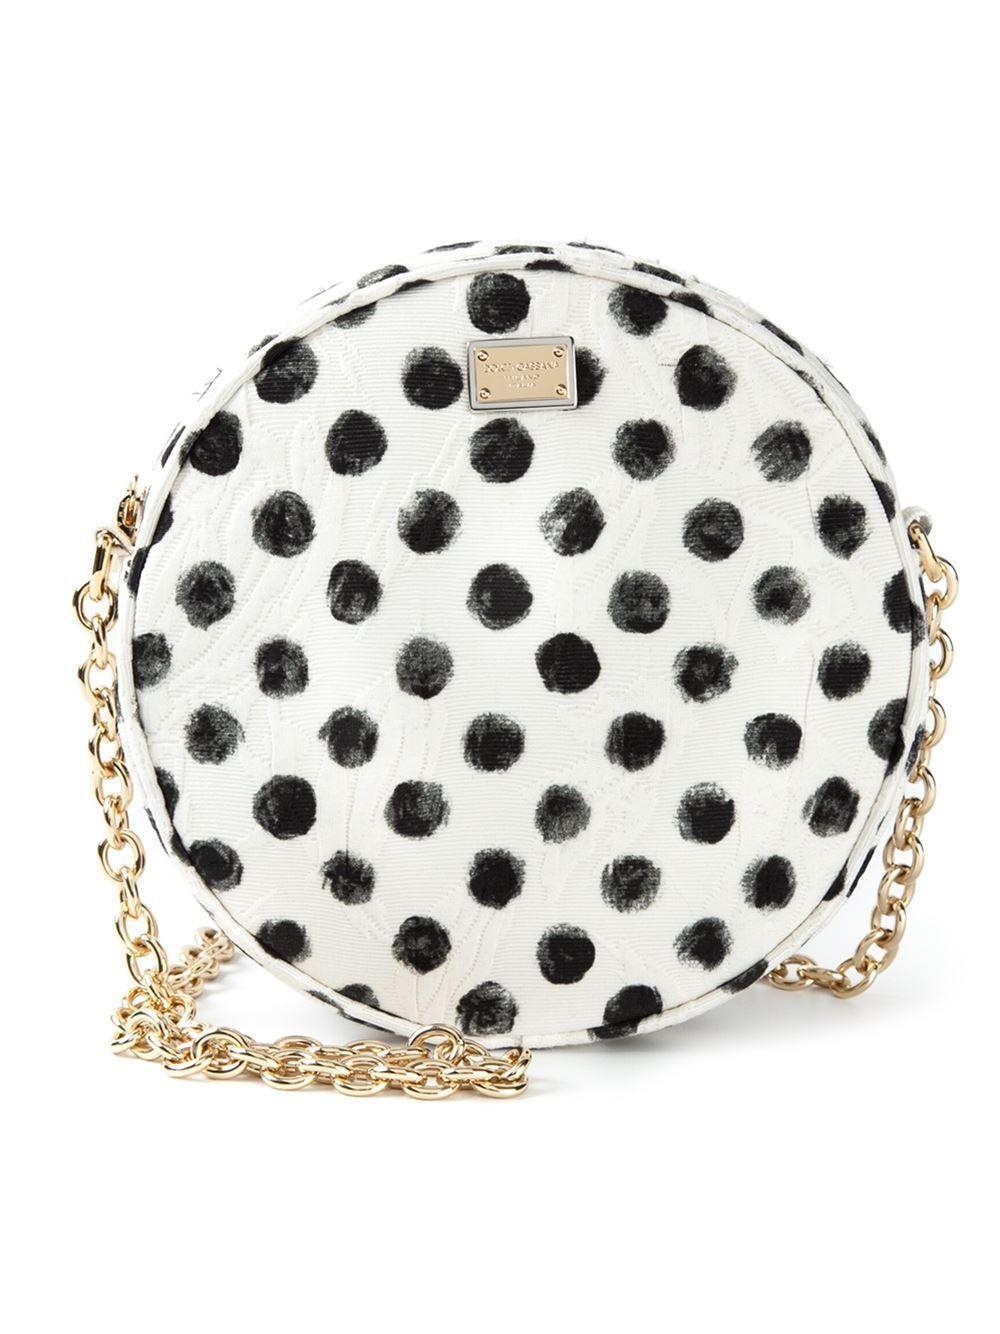 651a17fc7fce Dolce & Gabbana 'glam' Shoulder Bag - Gisa - Farfetch.com | HANDBAGS ...